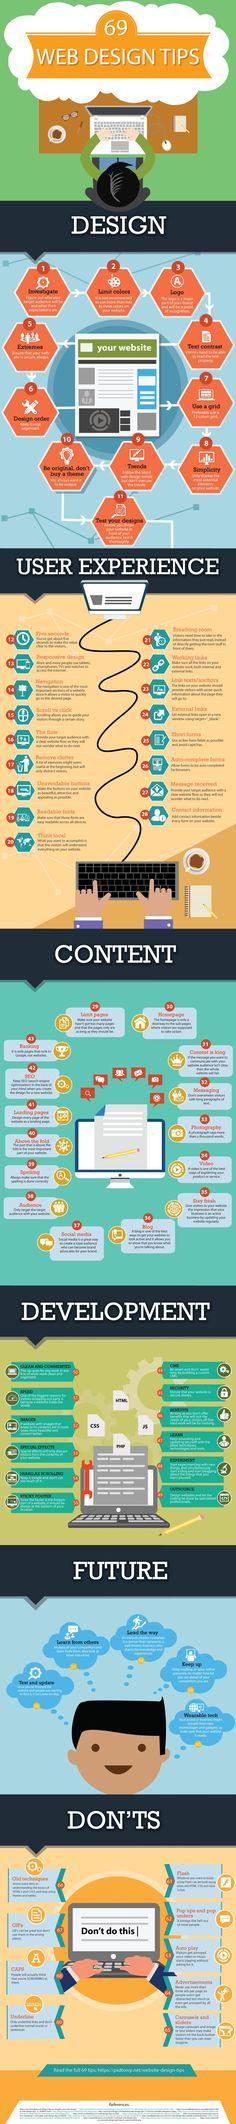 69 #WebDesign Tips [#infographic]